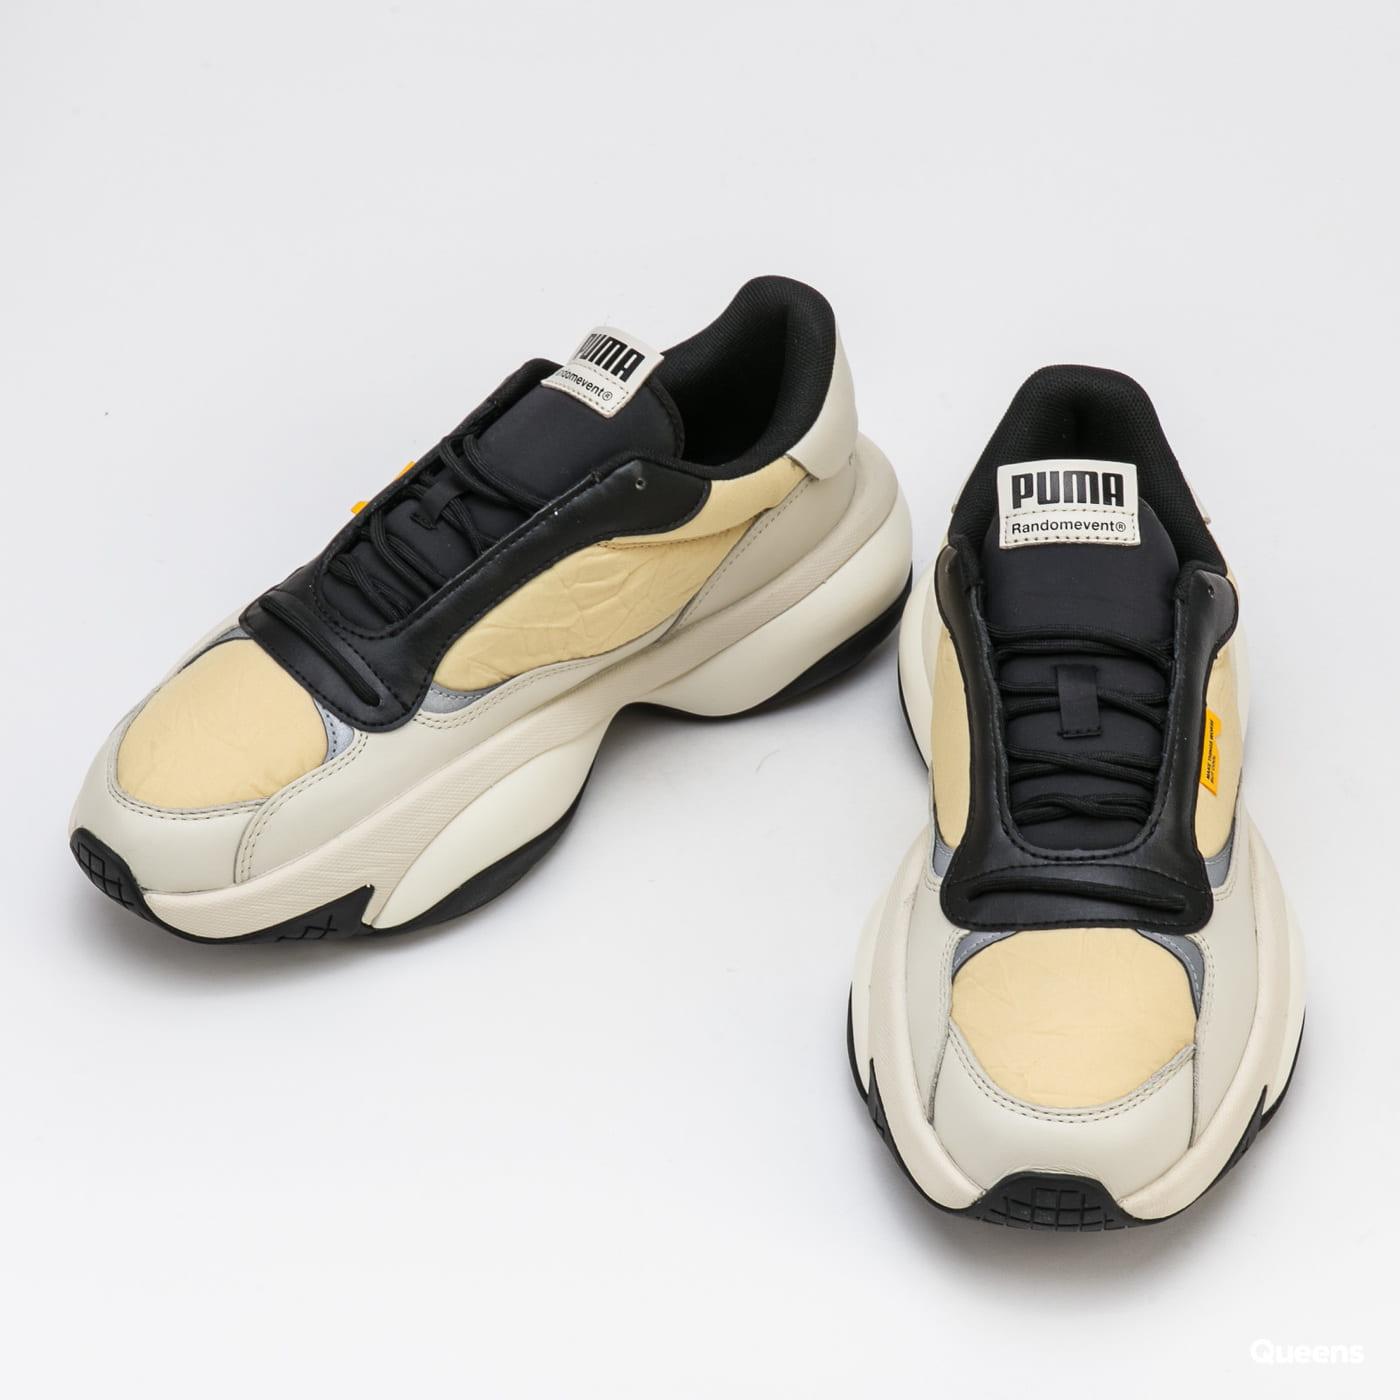 Sneakers Puma Alteration Randomevent